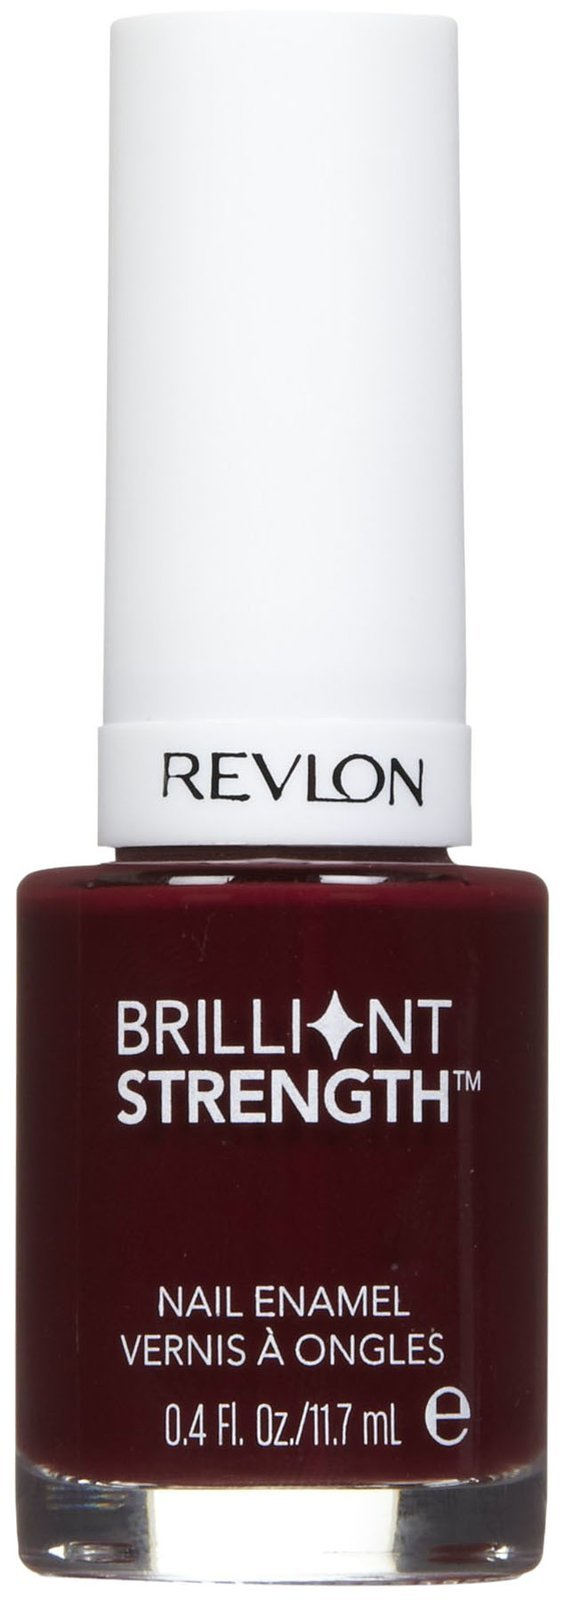 Revlon Brilliant Strength Nail Enamel - Persuade - 0.4 oz